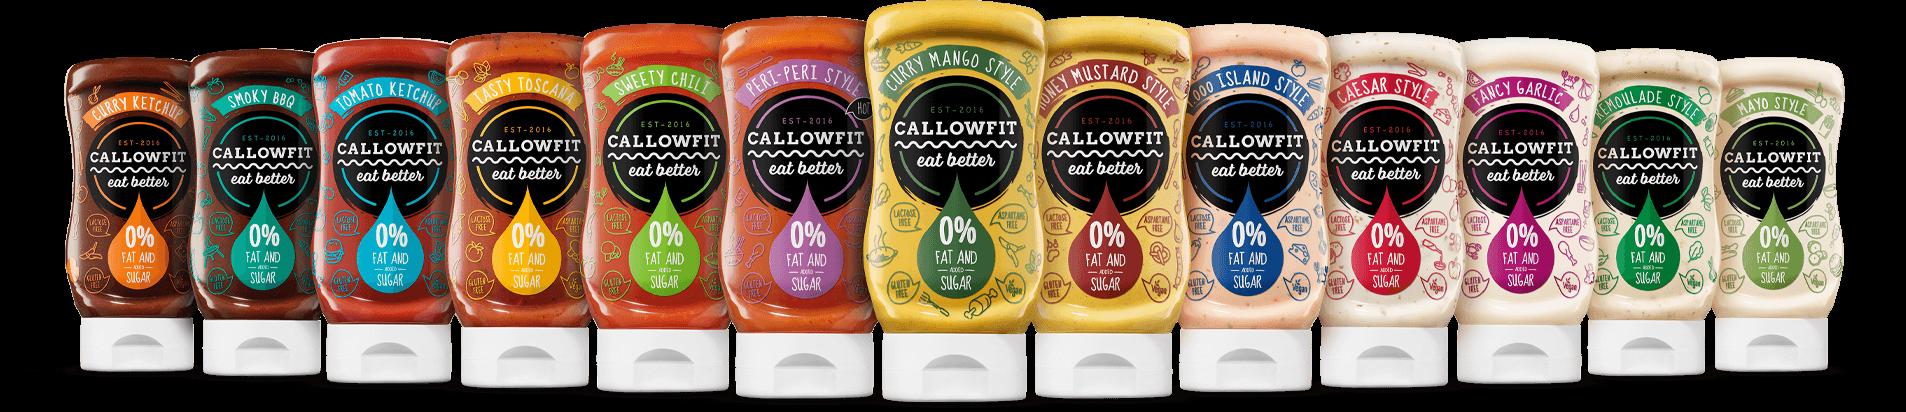 Real Nutrition website banner - callowfit maaltijd saus